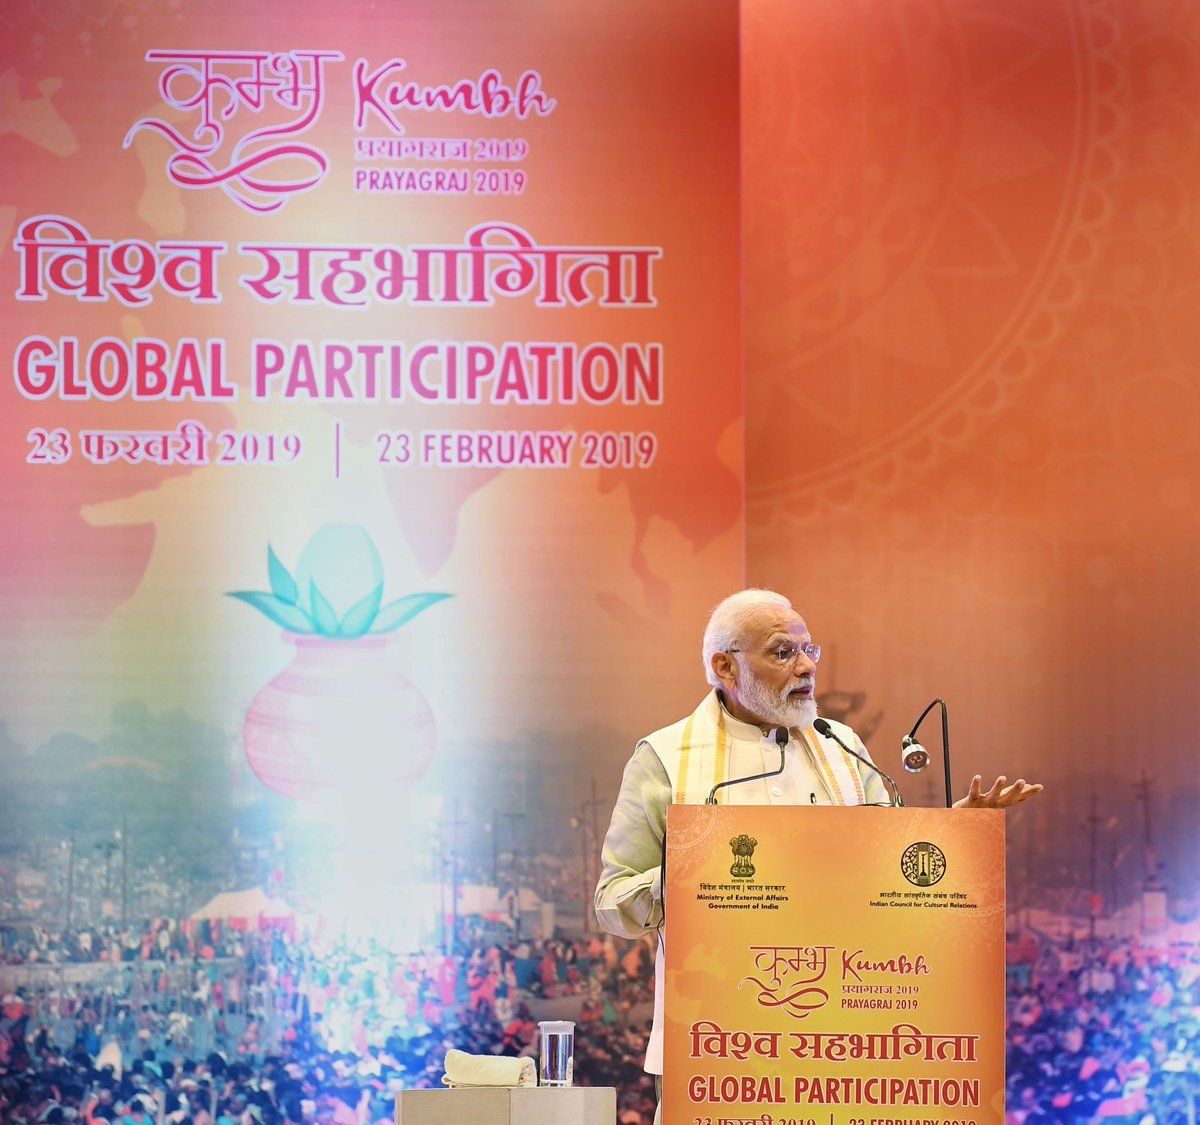 Prime Minister, Shri @narendramodi addressing the Pravasi Bhartiya representatives at #PravasiBhartiyaKendra, in New Delhi.